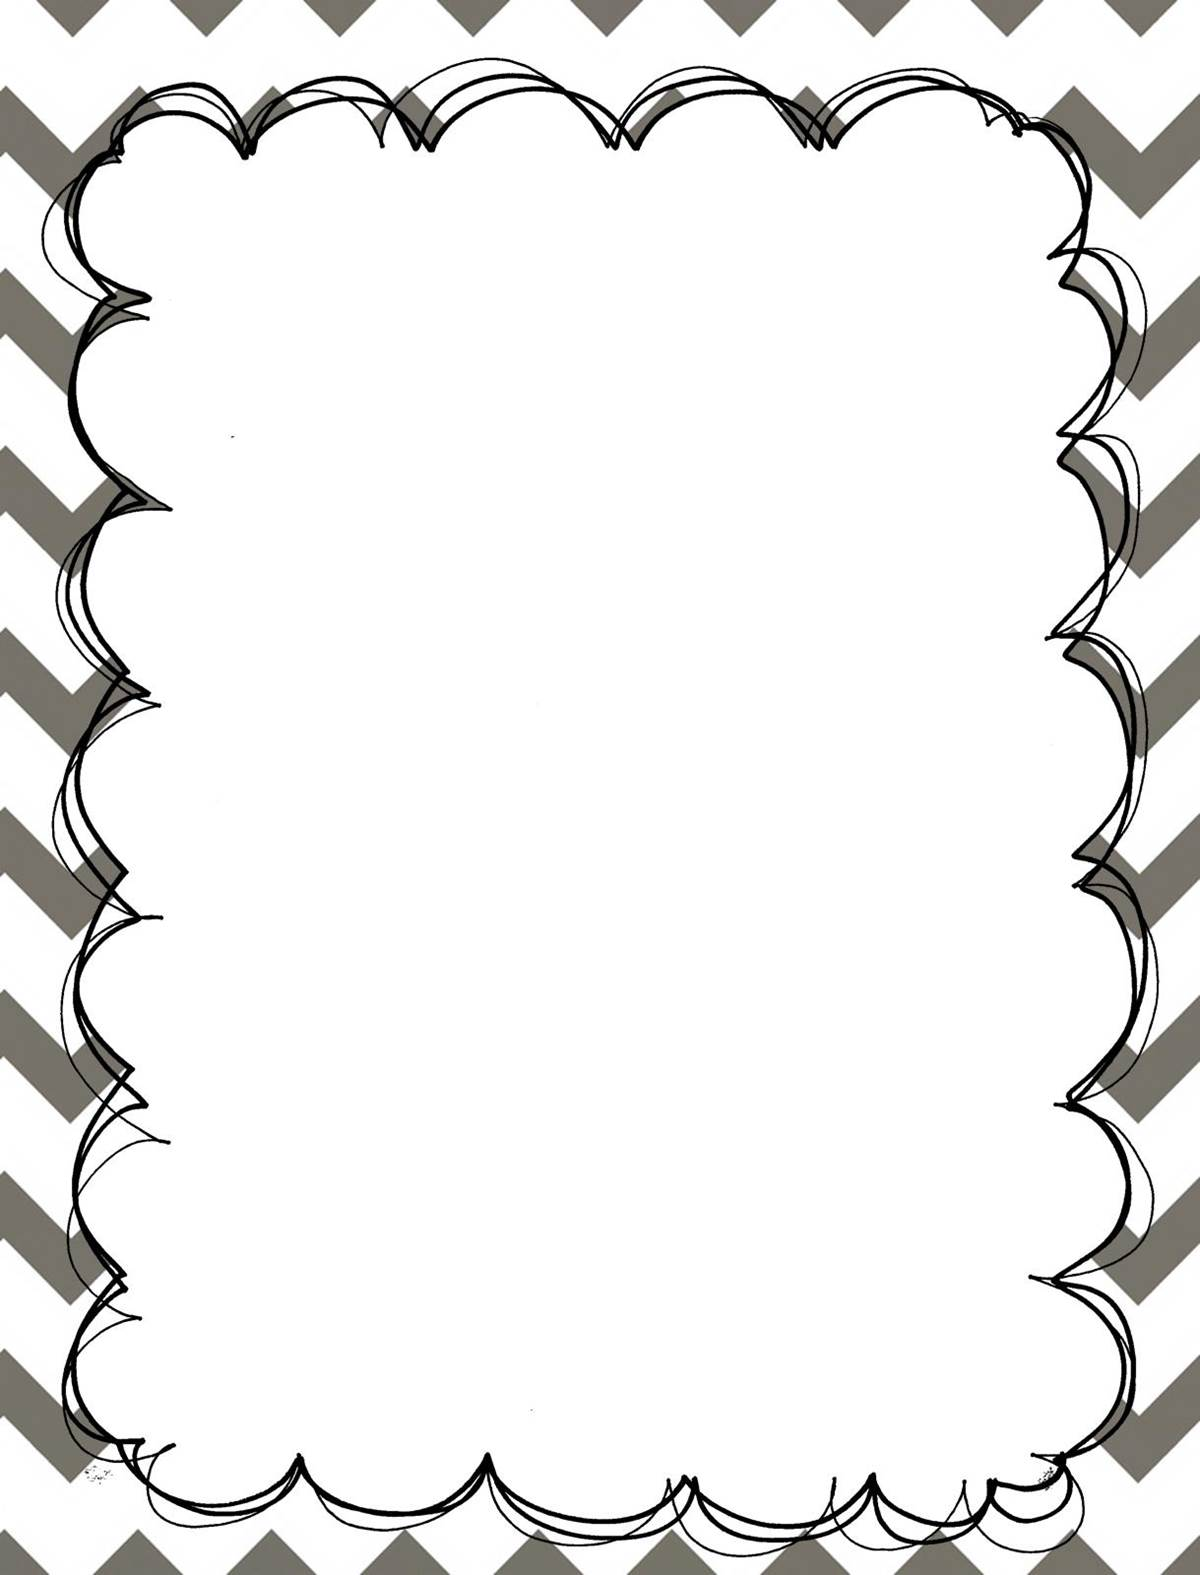 Displaying 19 gt...1 1 2 Binder Spine Template